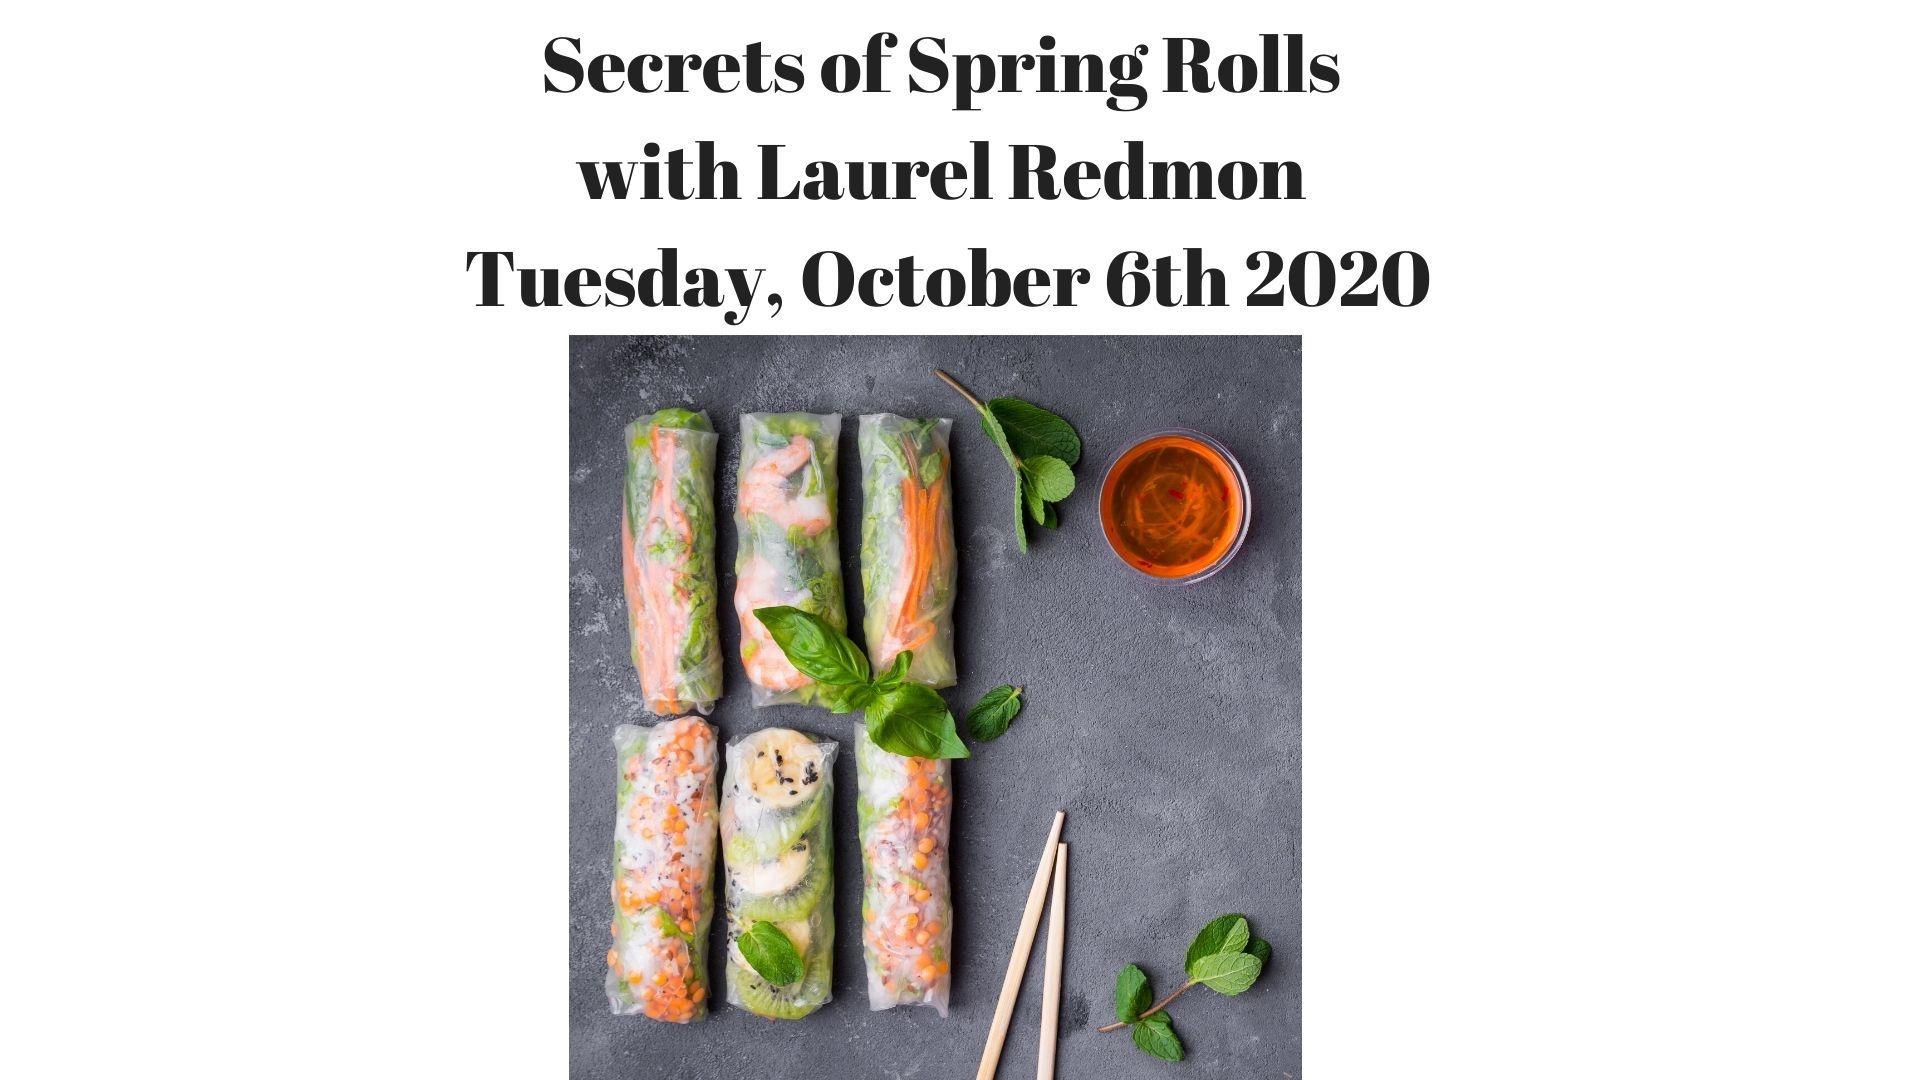 Secrets of Spring Rolls - Laurel Redmon October 6th